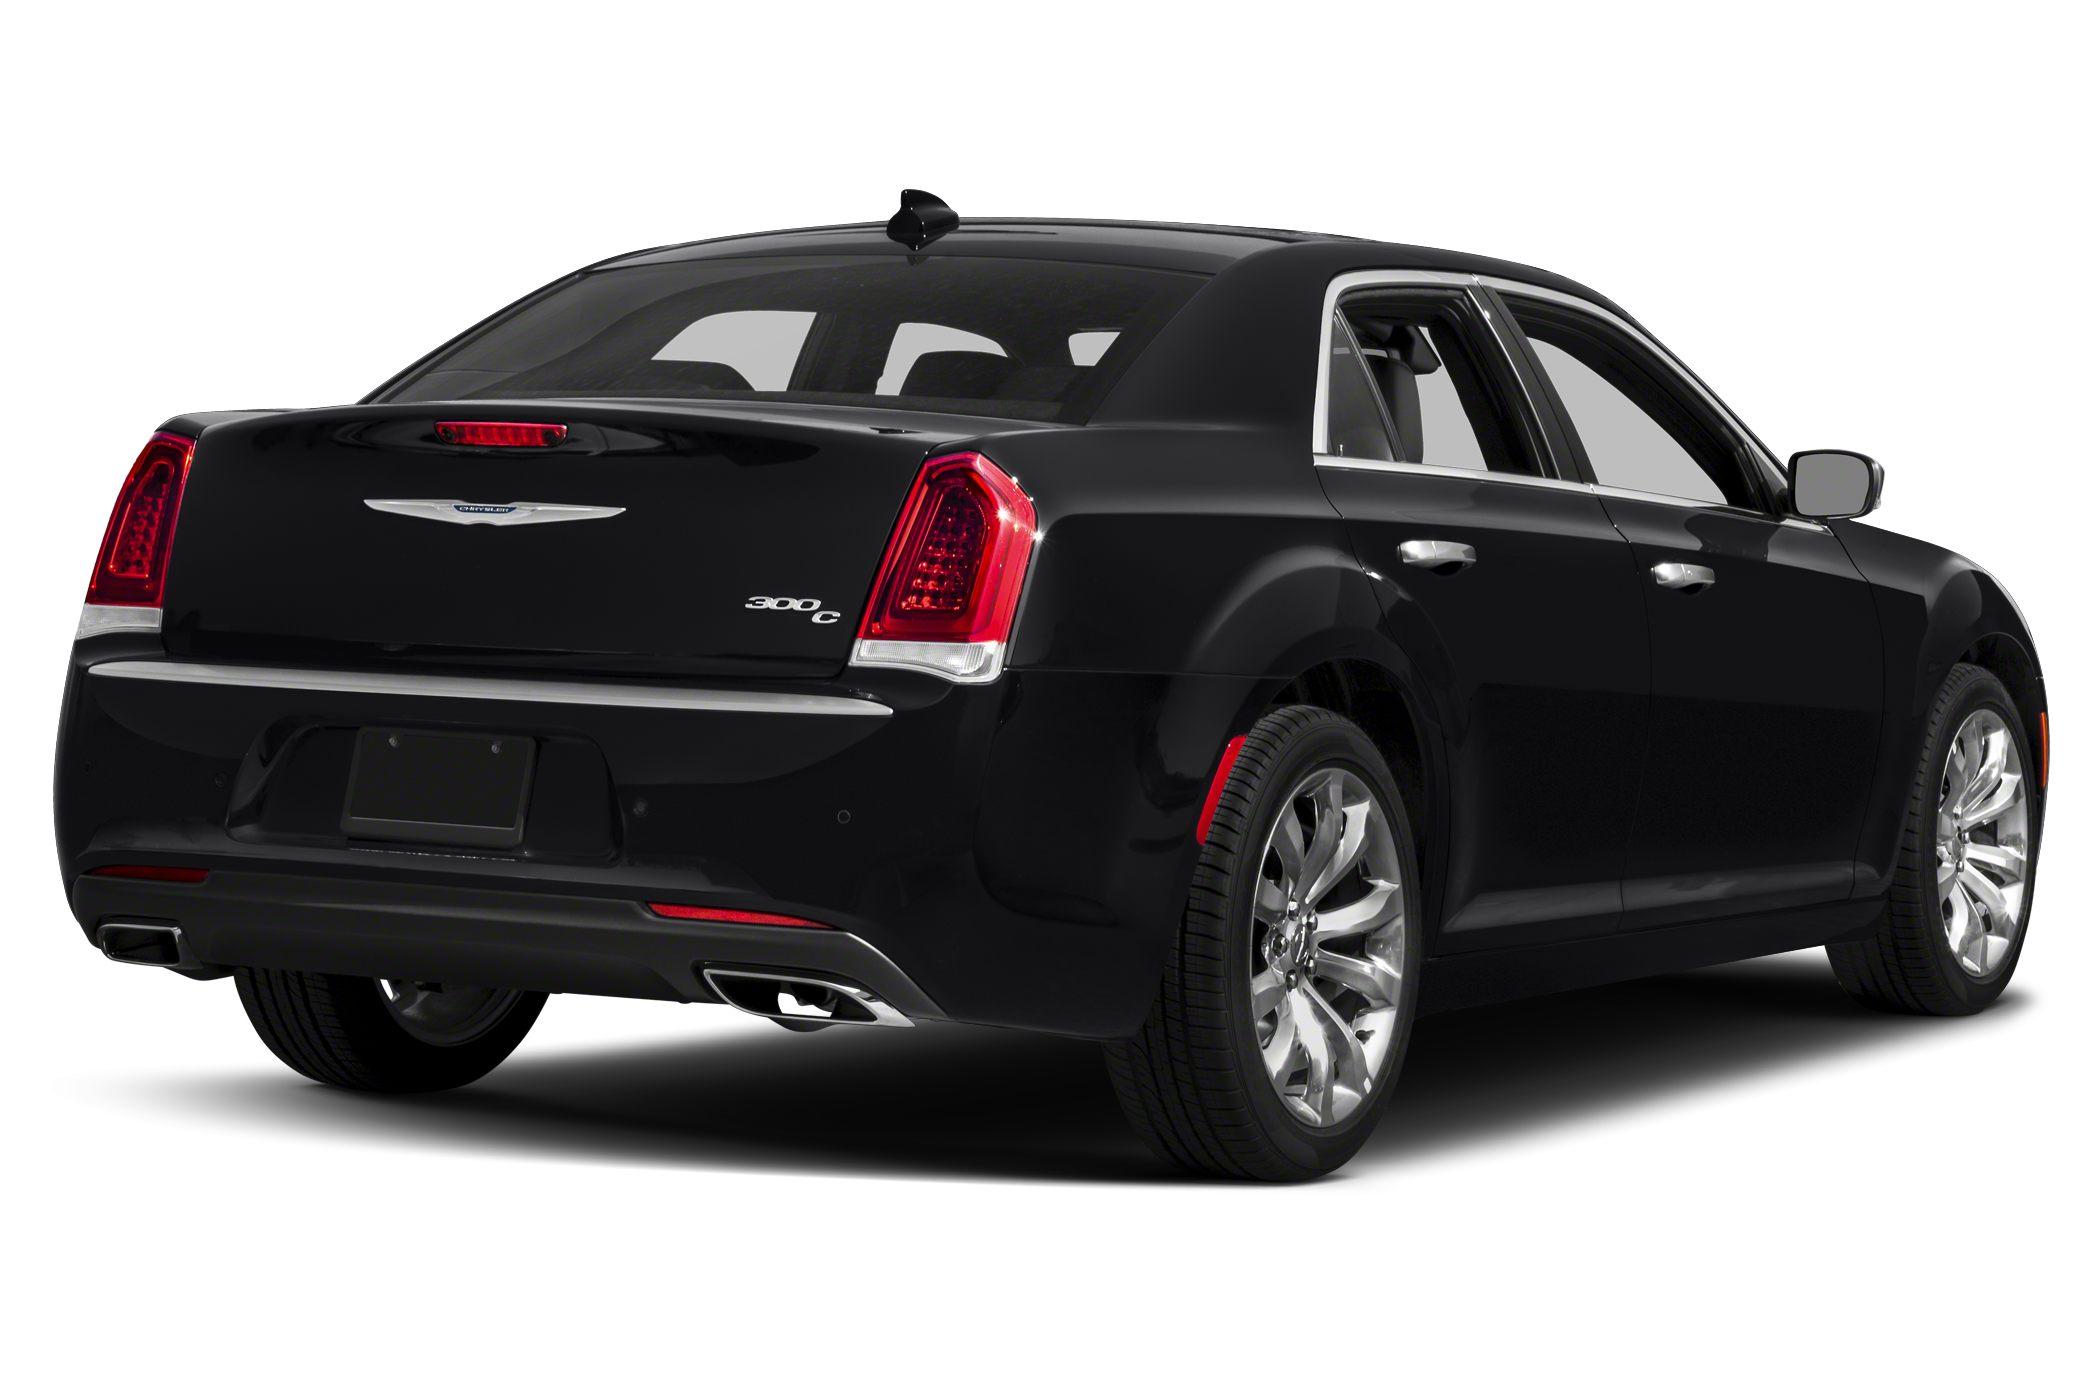 2017 Chrysler 300c Reviews Specs And Prices Cars Com